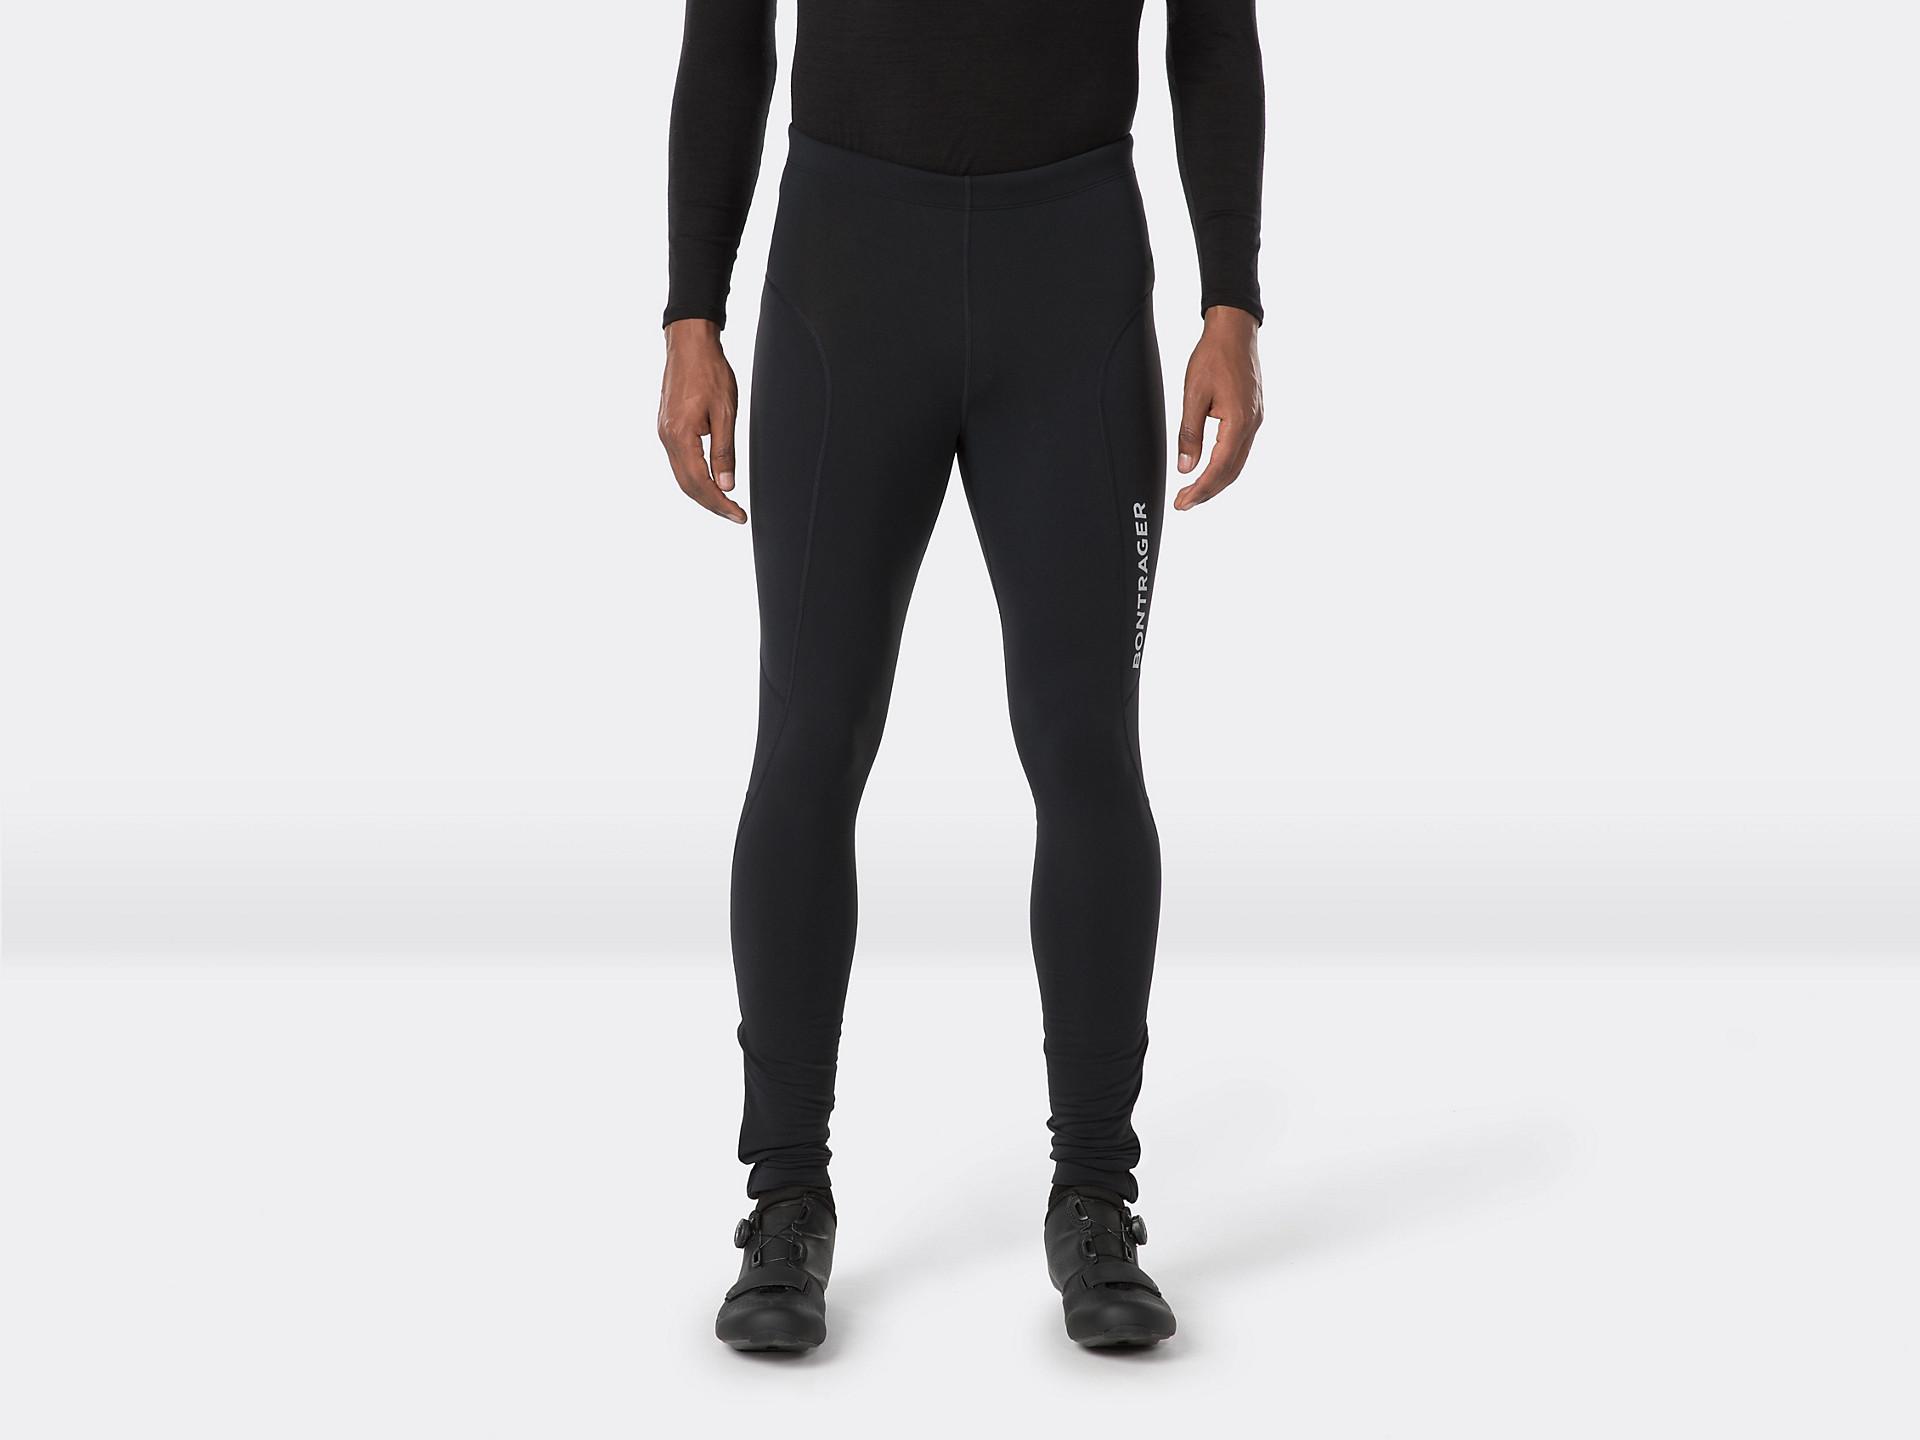 Black New 2015 Men/'s Bontrager Trek Factory Racing Cycling Leg Warmers Size S